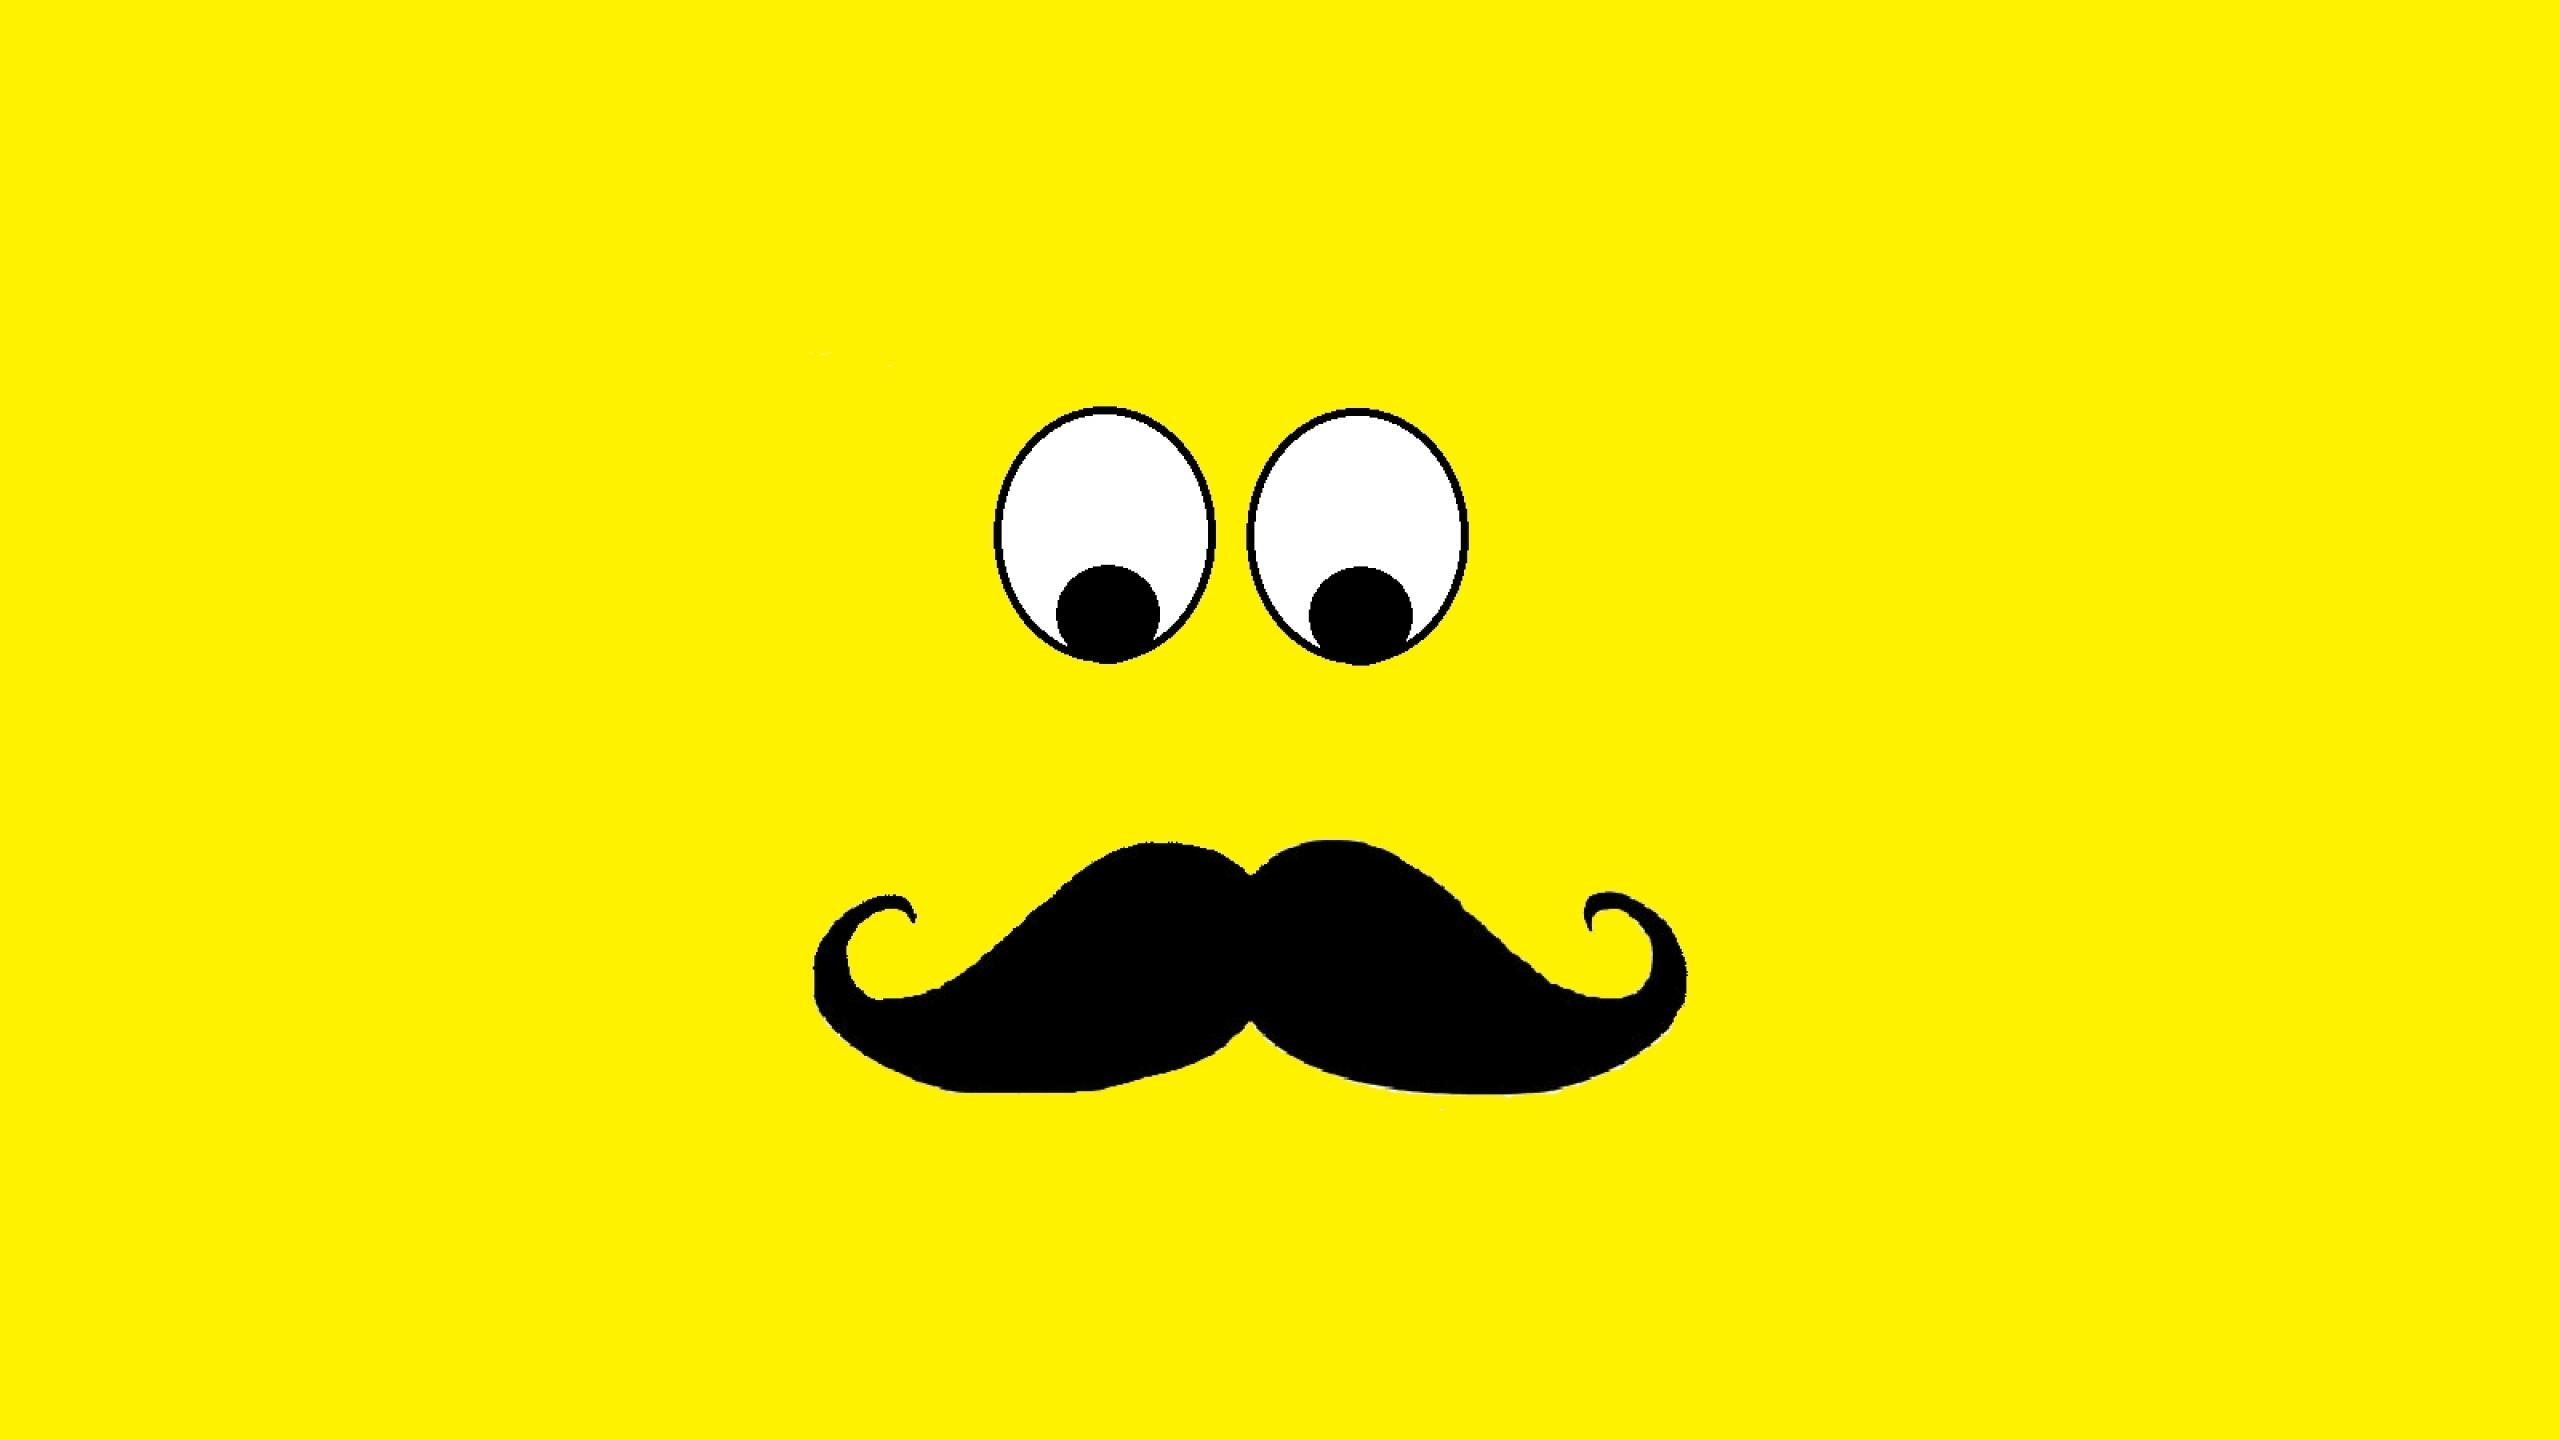 mustache iphone wallpaper hd - photo #25